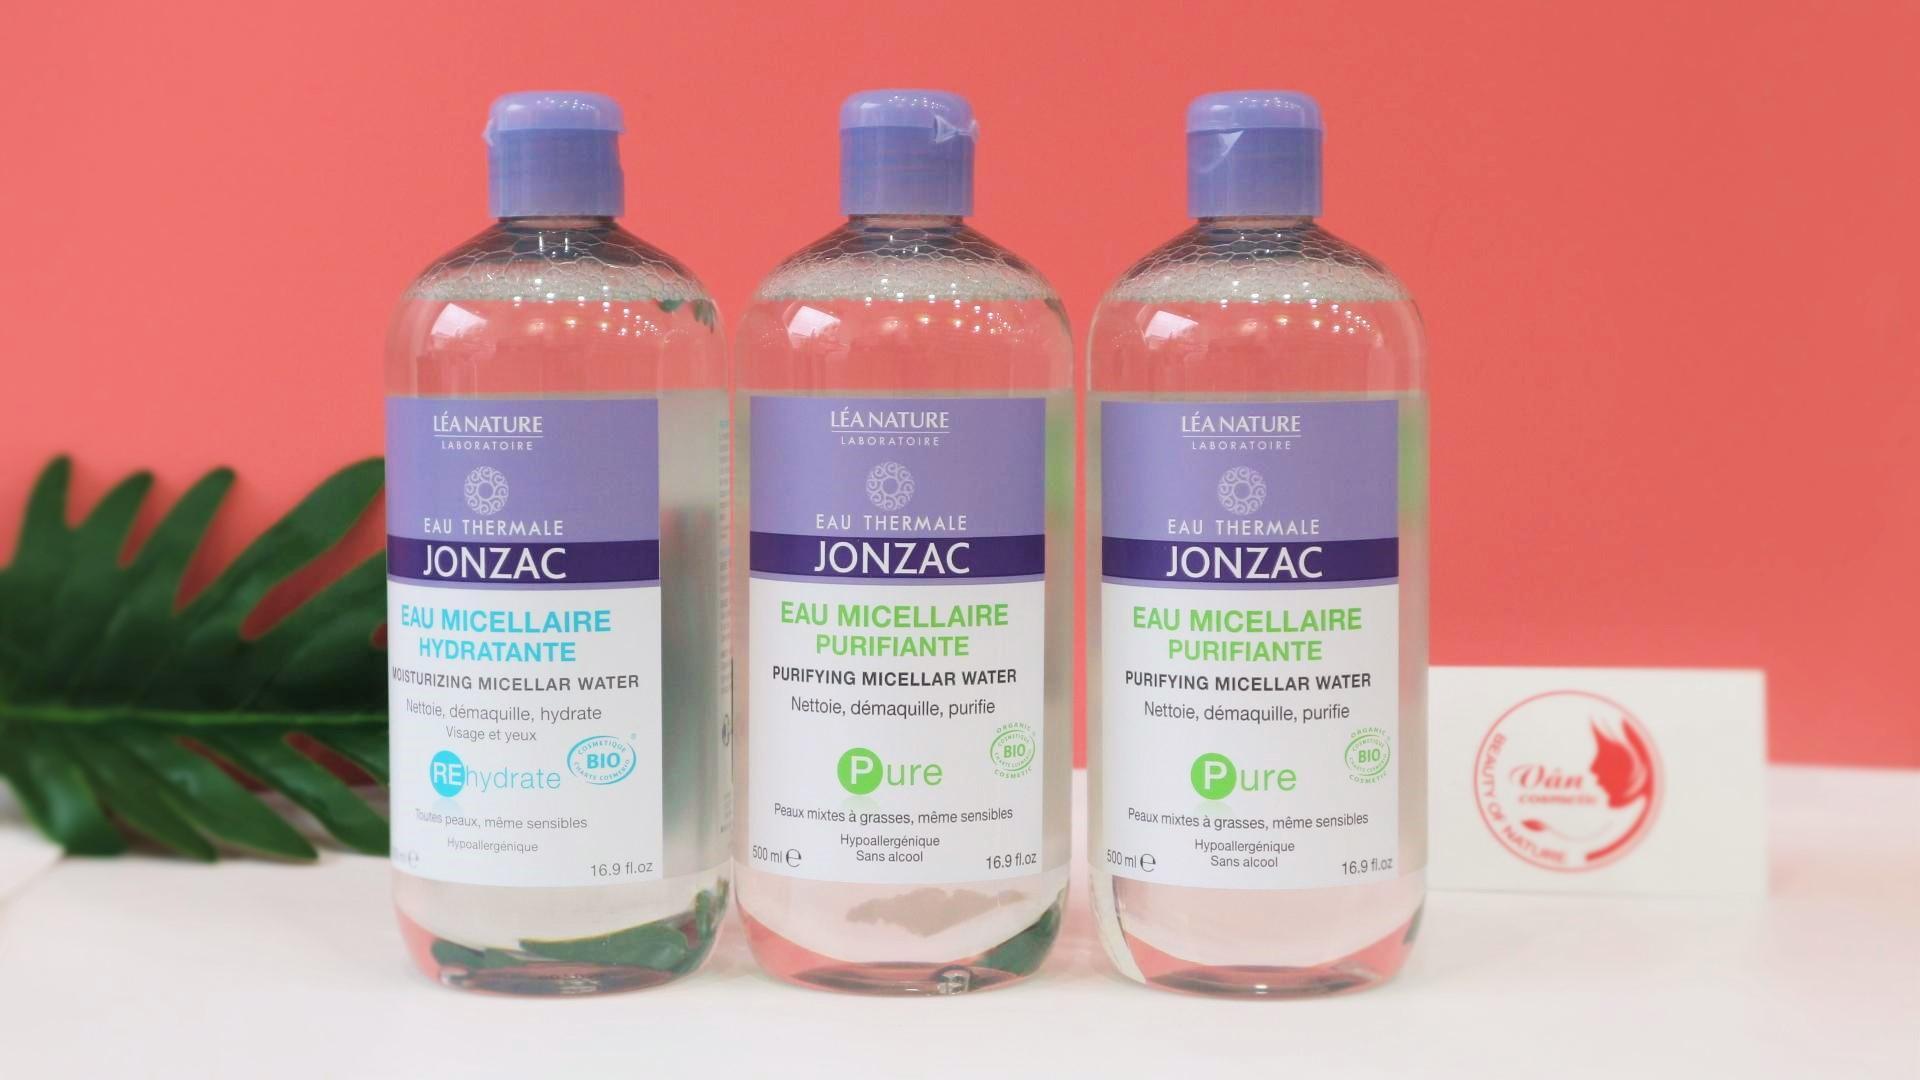 Nước Tẩy Trang Eau Thermale Jonzac Micellar Water